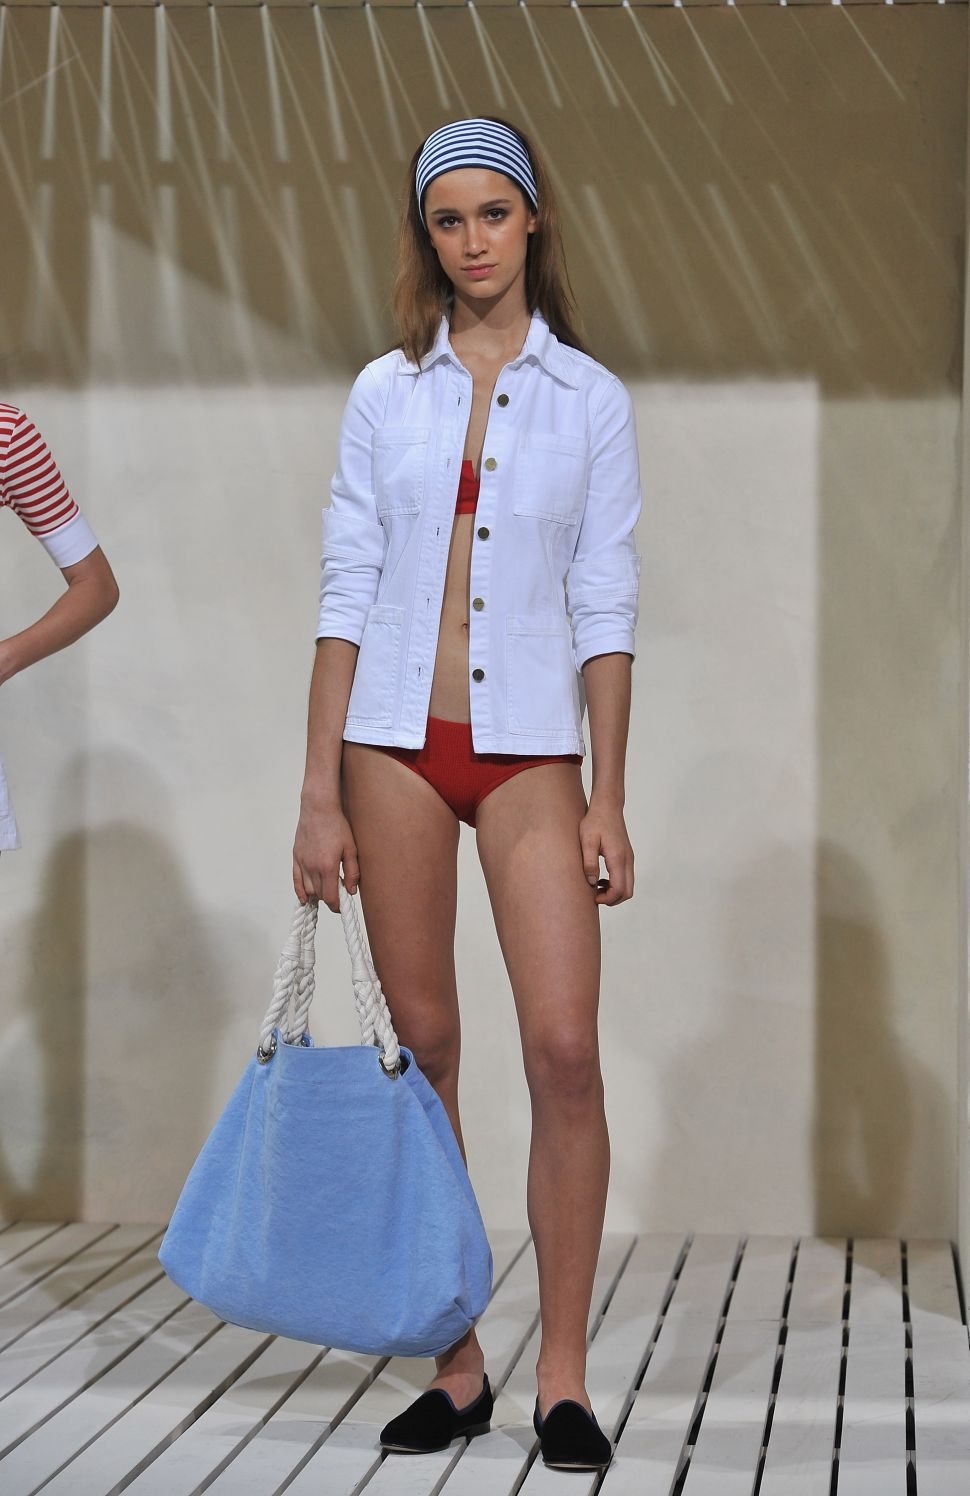 Fashion's Favorite Denim Line Branches Out Into Swimwear